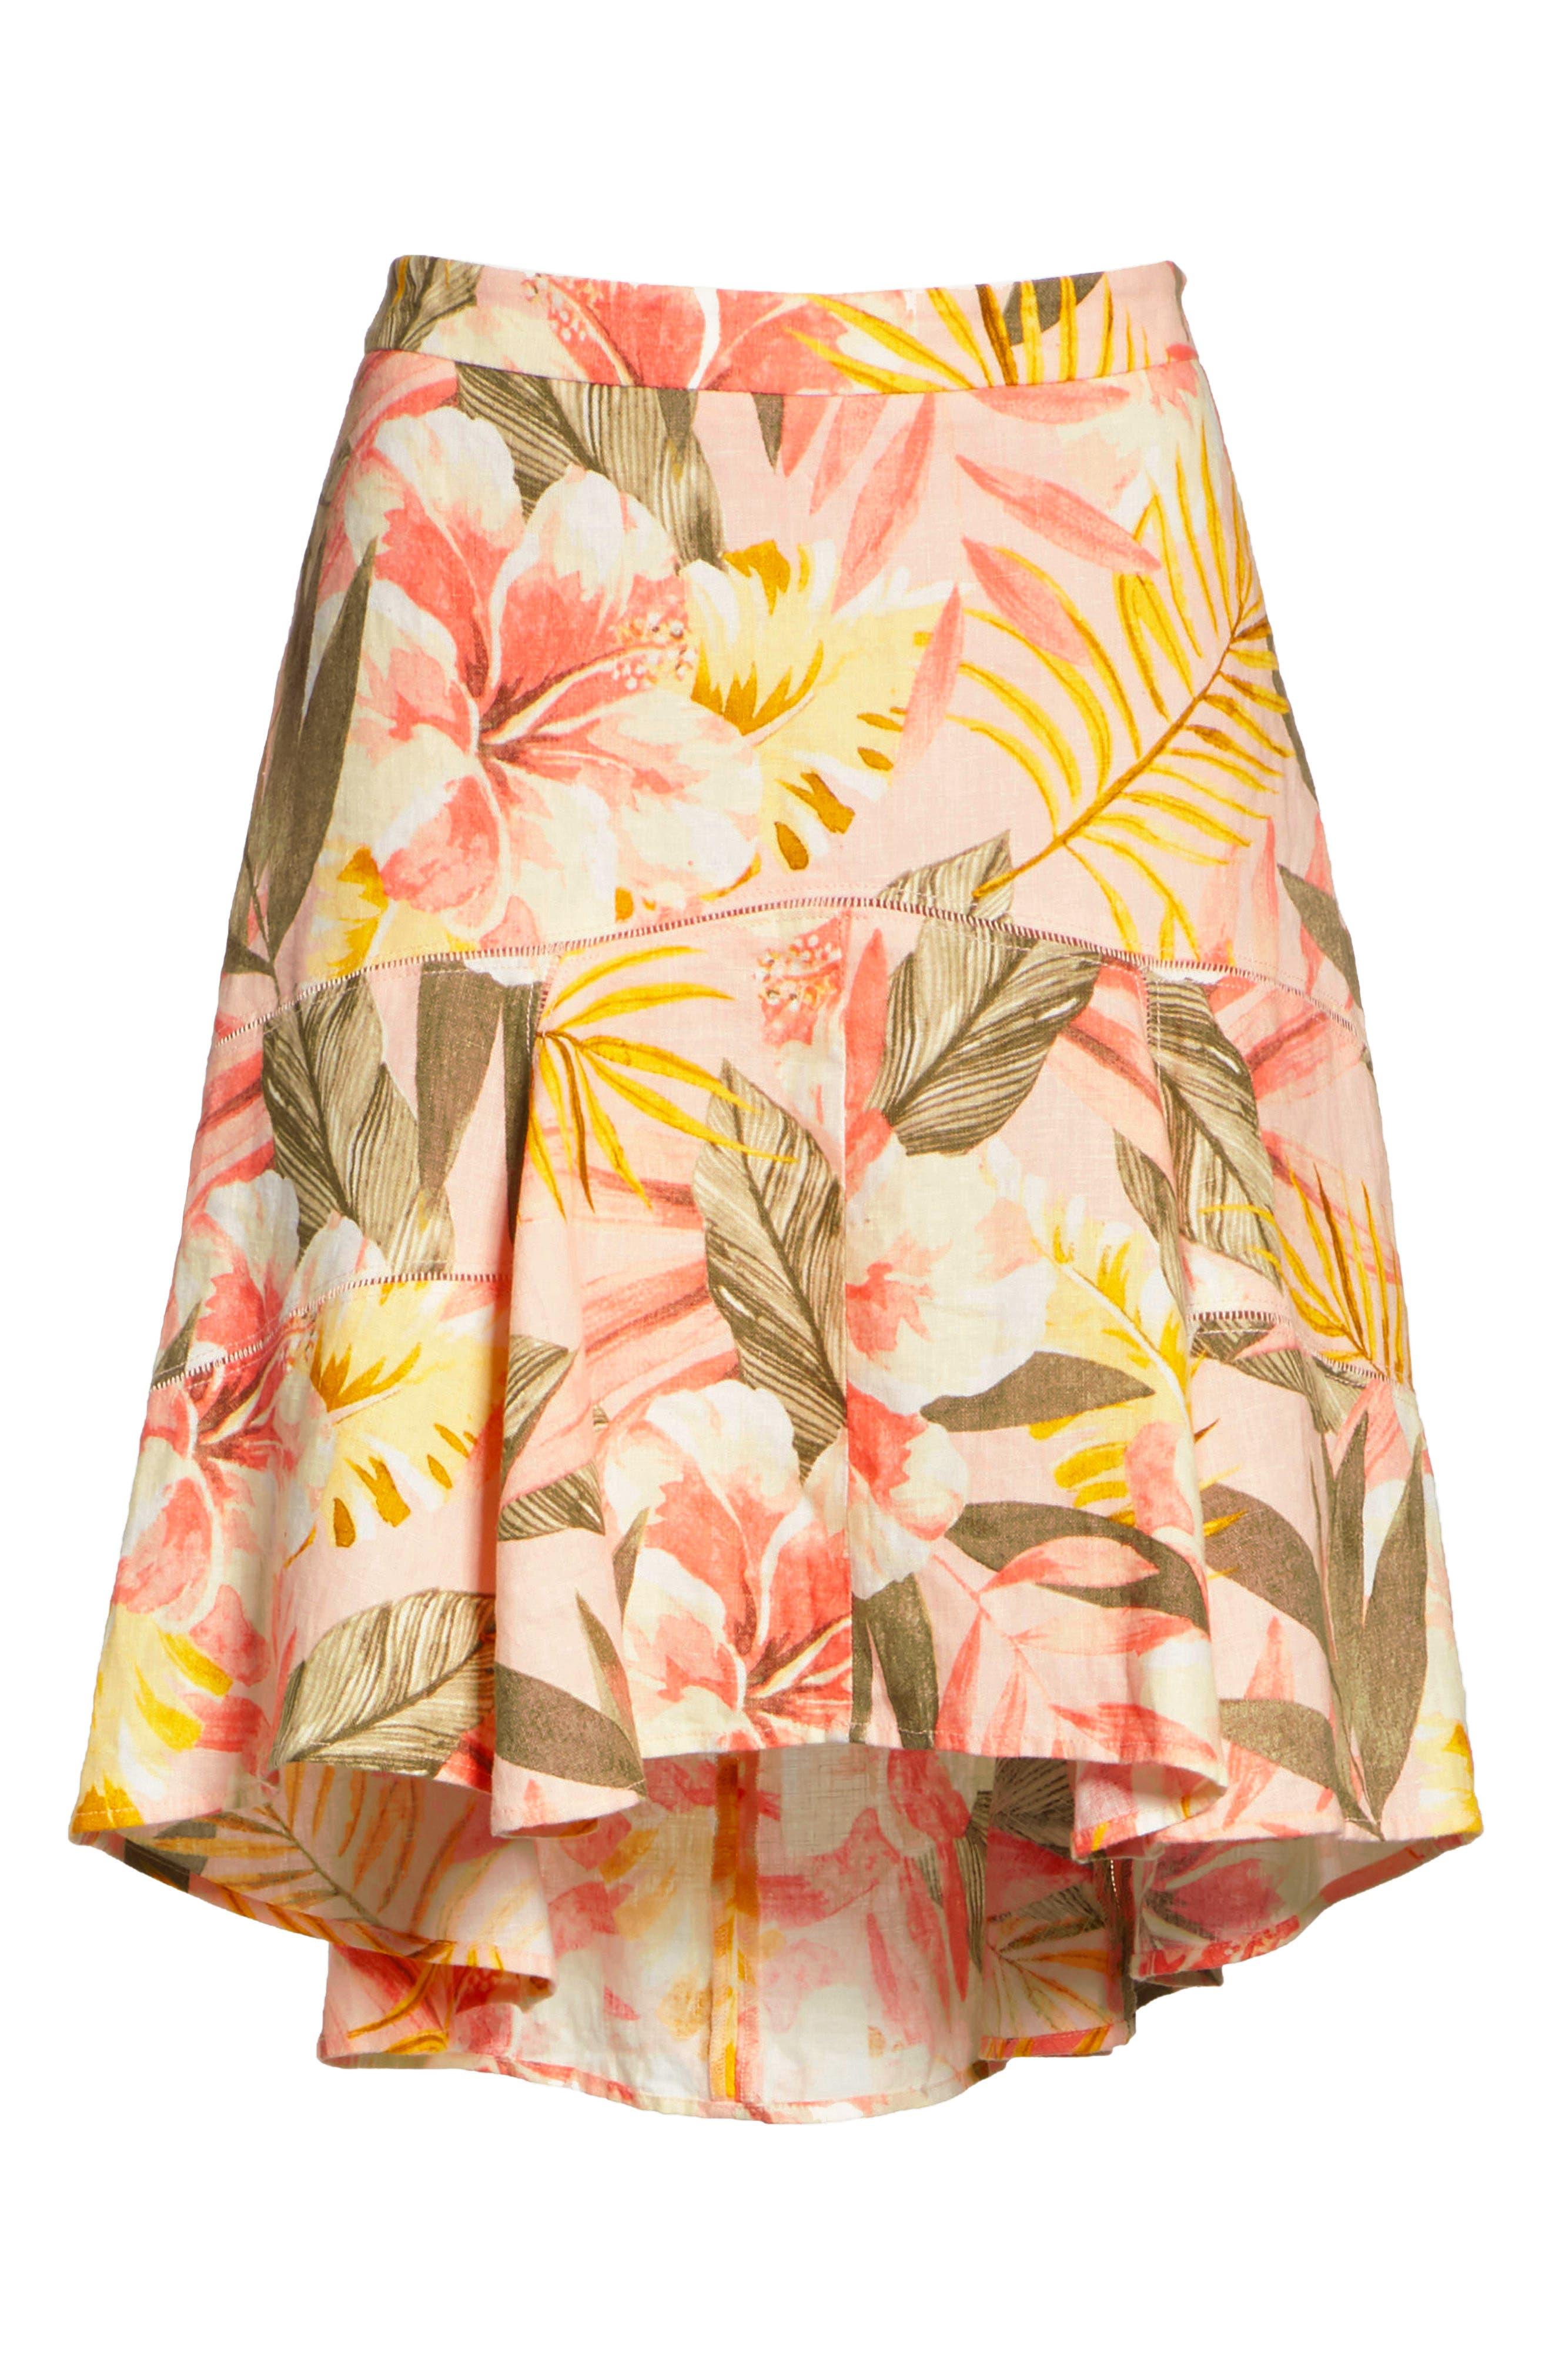 Radhiya Linen Floral Ruffle Skirt,                             Alternate thumbnail 6, color,                             Dusty Nude